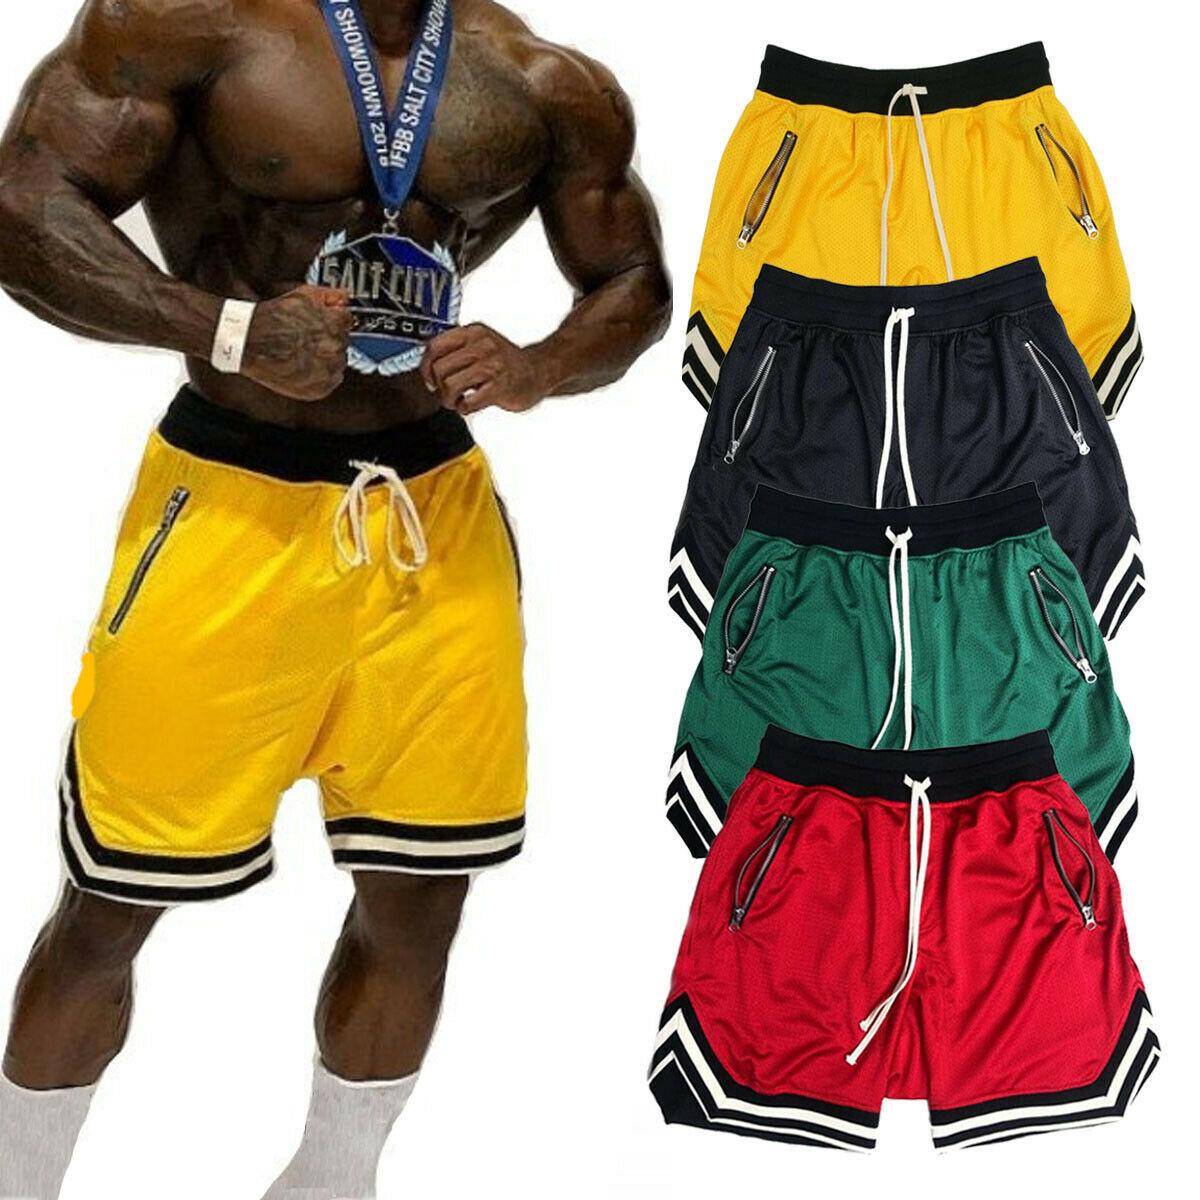 Hirigin Fashion Men's Summer Casual Shorts Gym Sports Training Bodybuilding Shorts